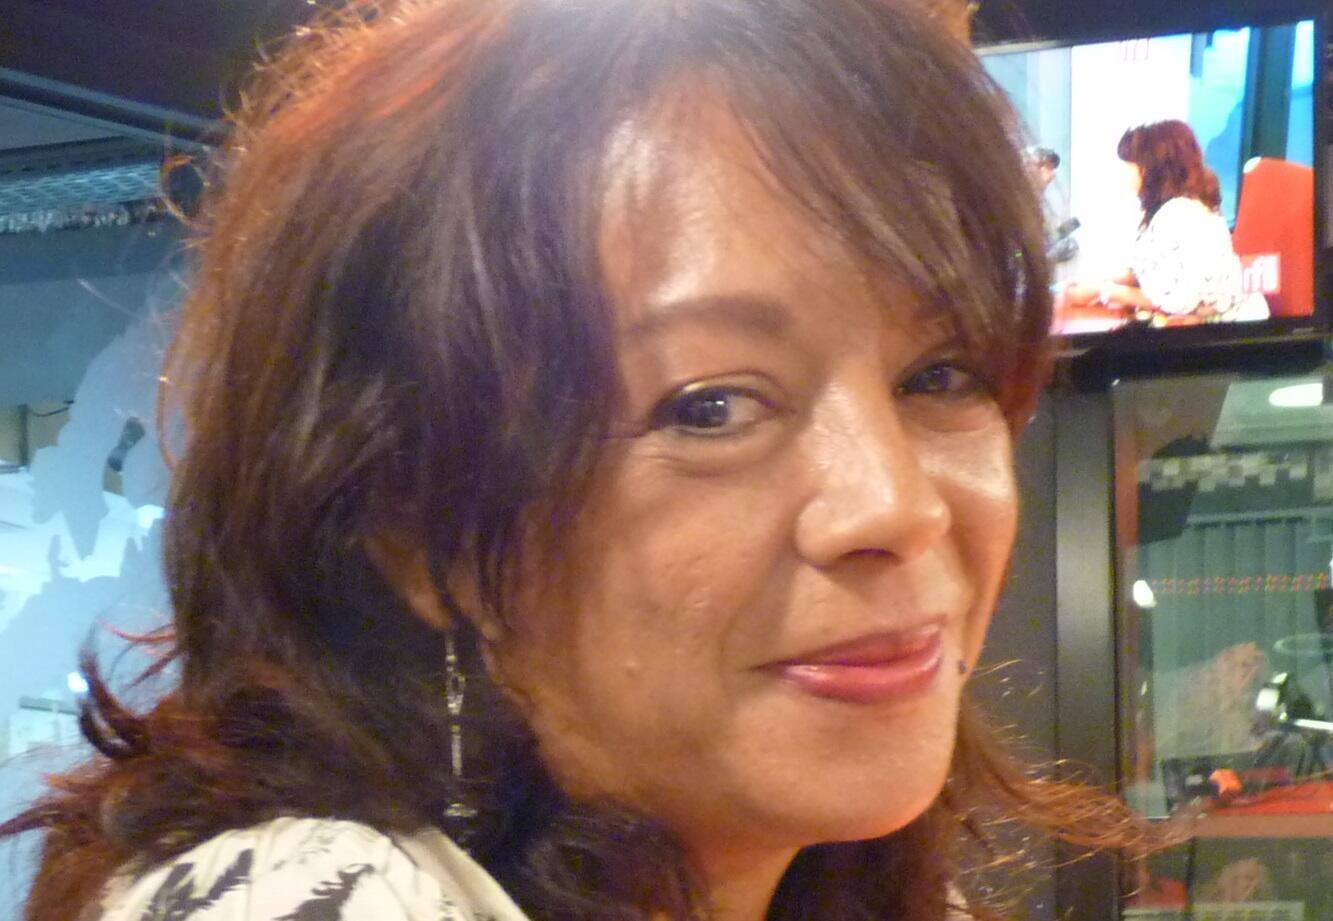 Natalia, La Tropikal, en los estudios de RFI